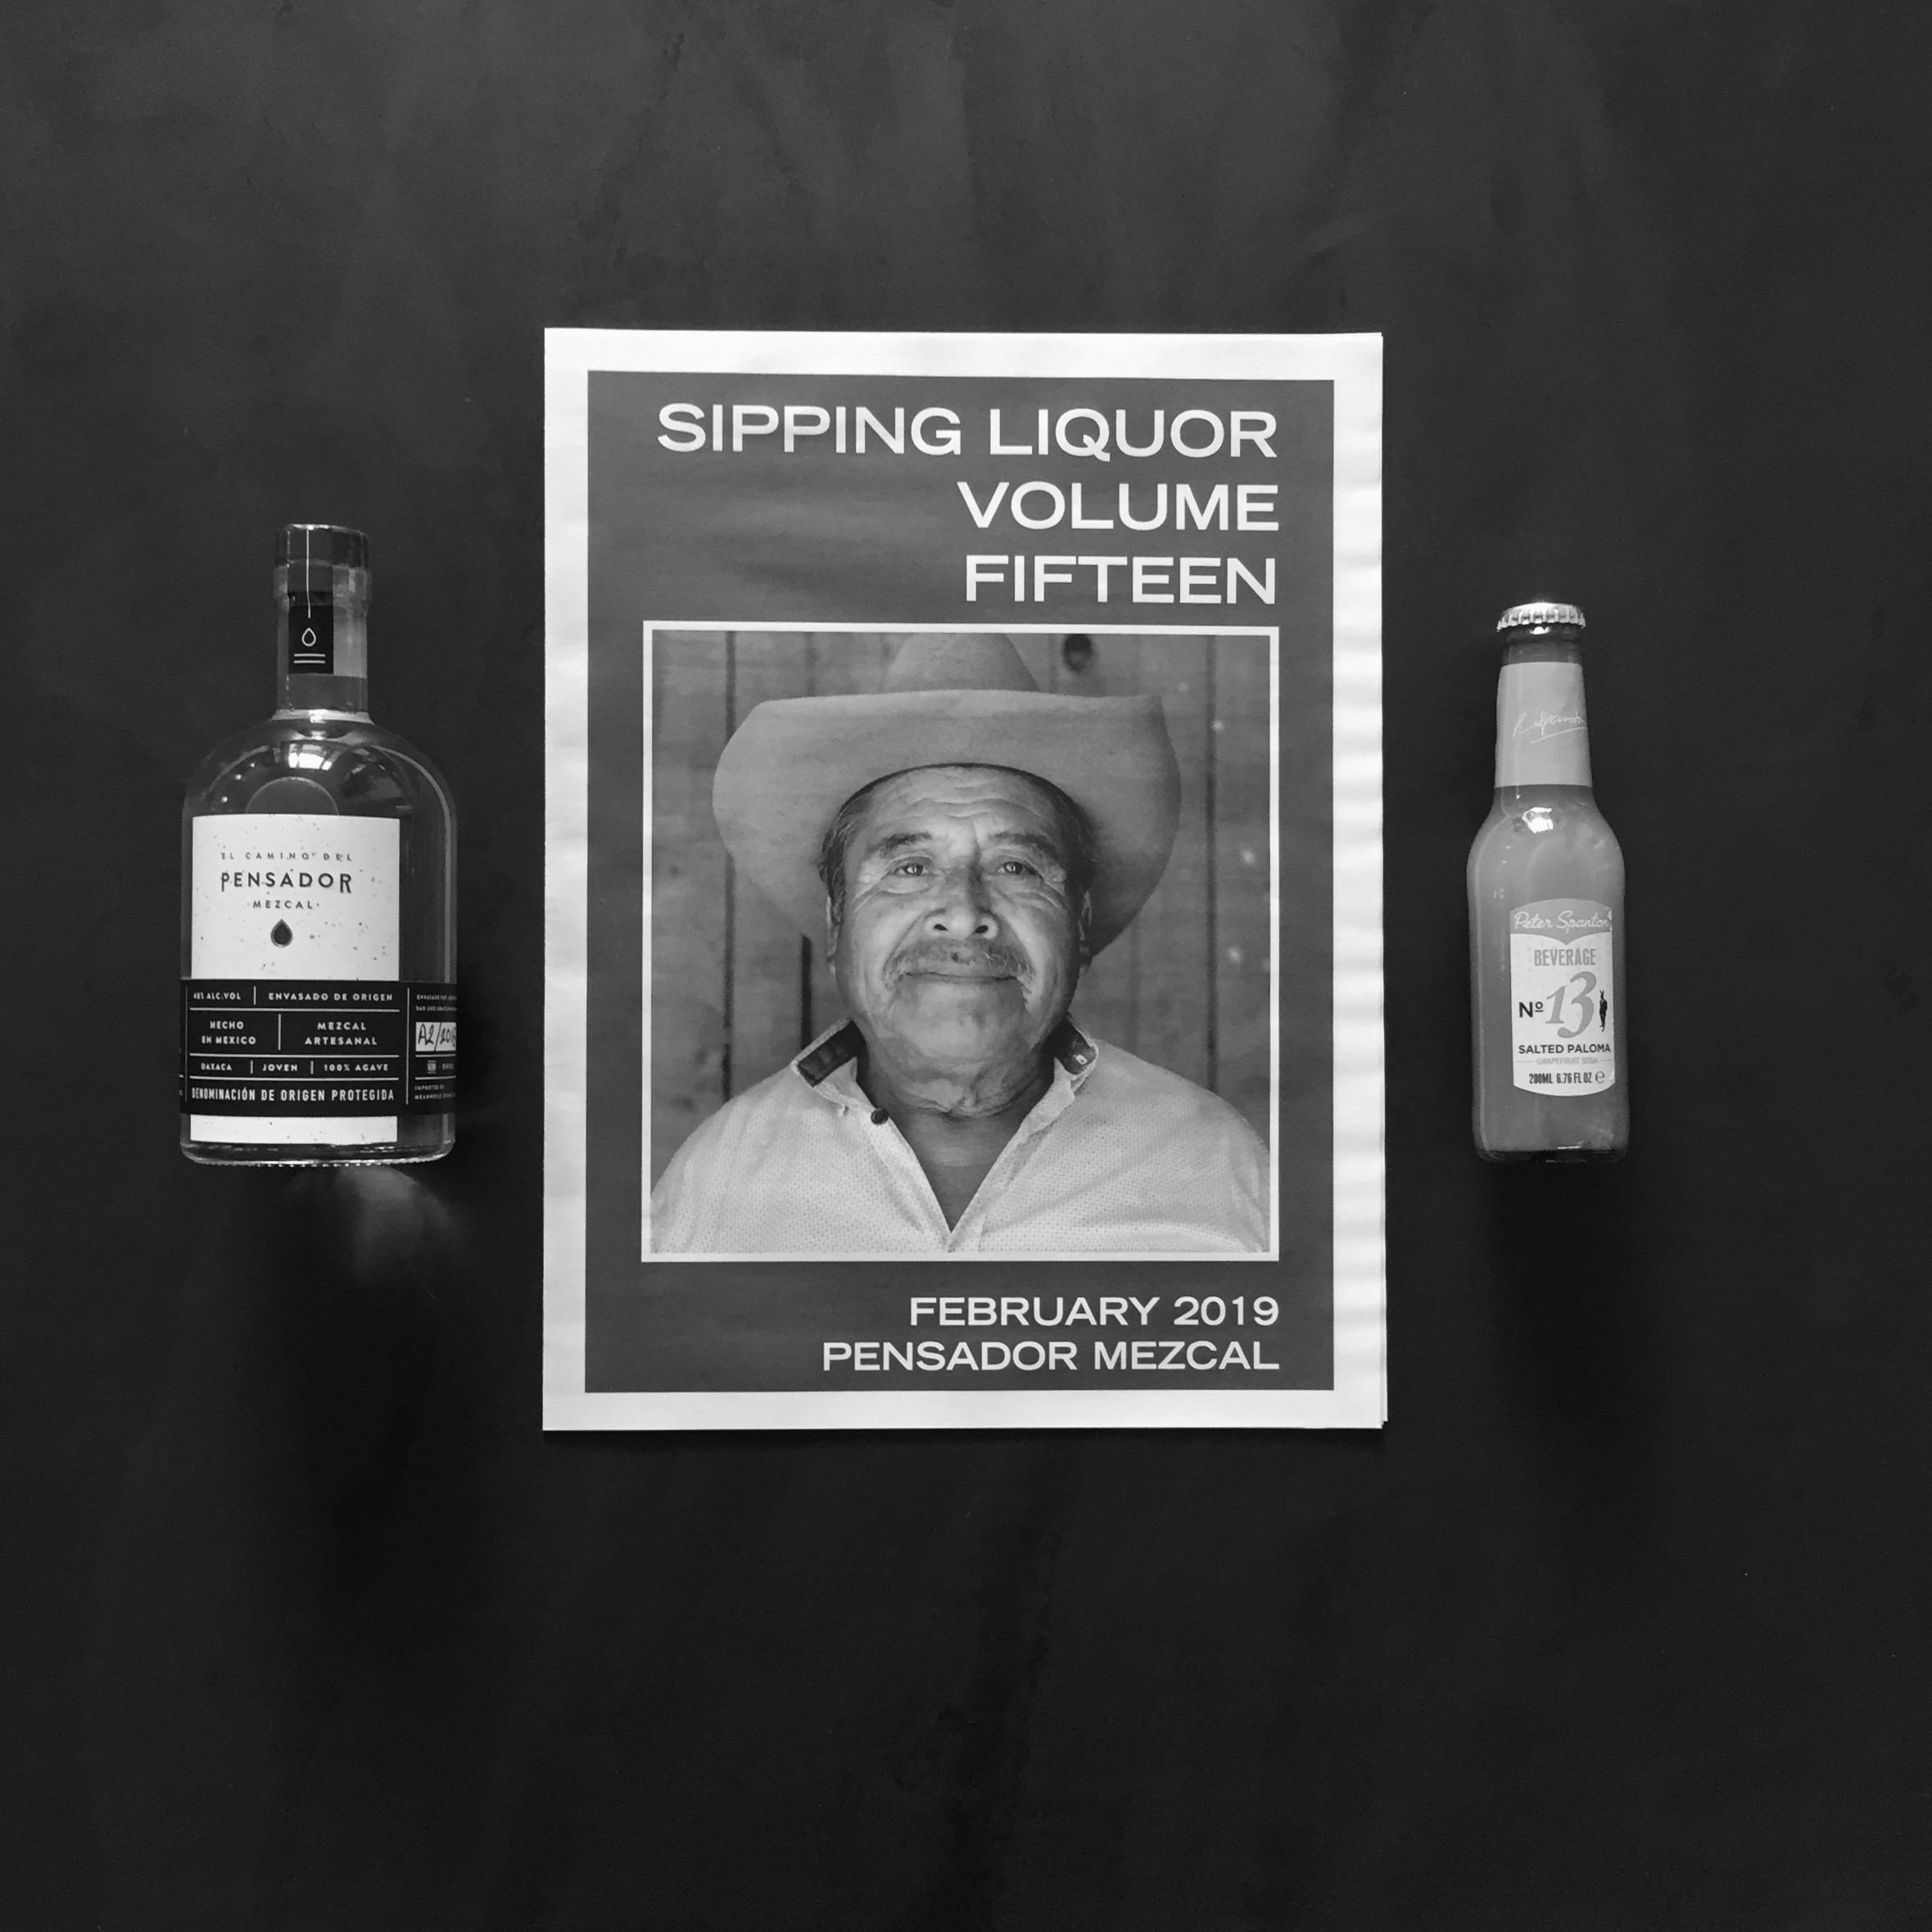 Sipping Liquor box with Pensador Mezcal